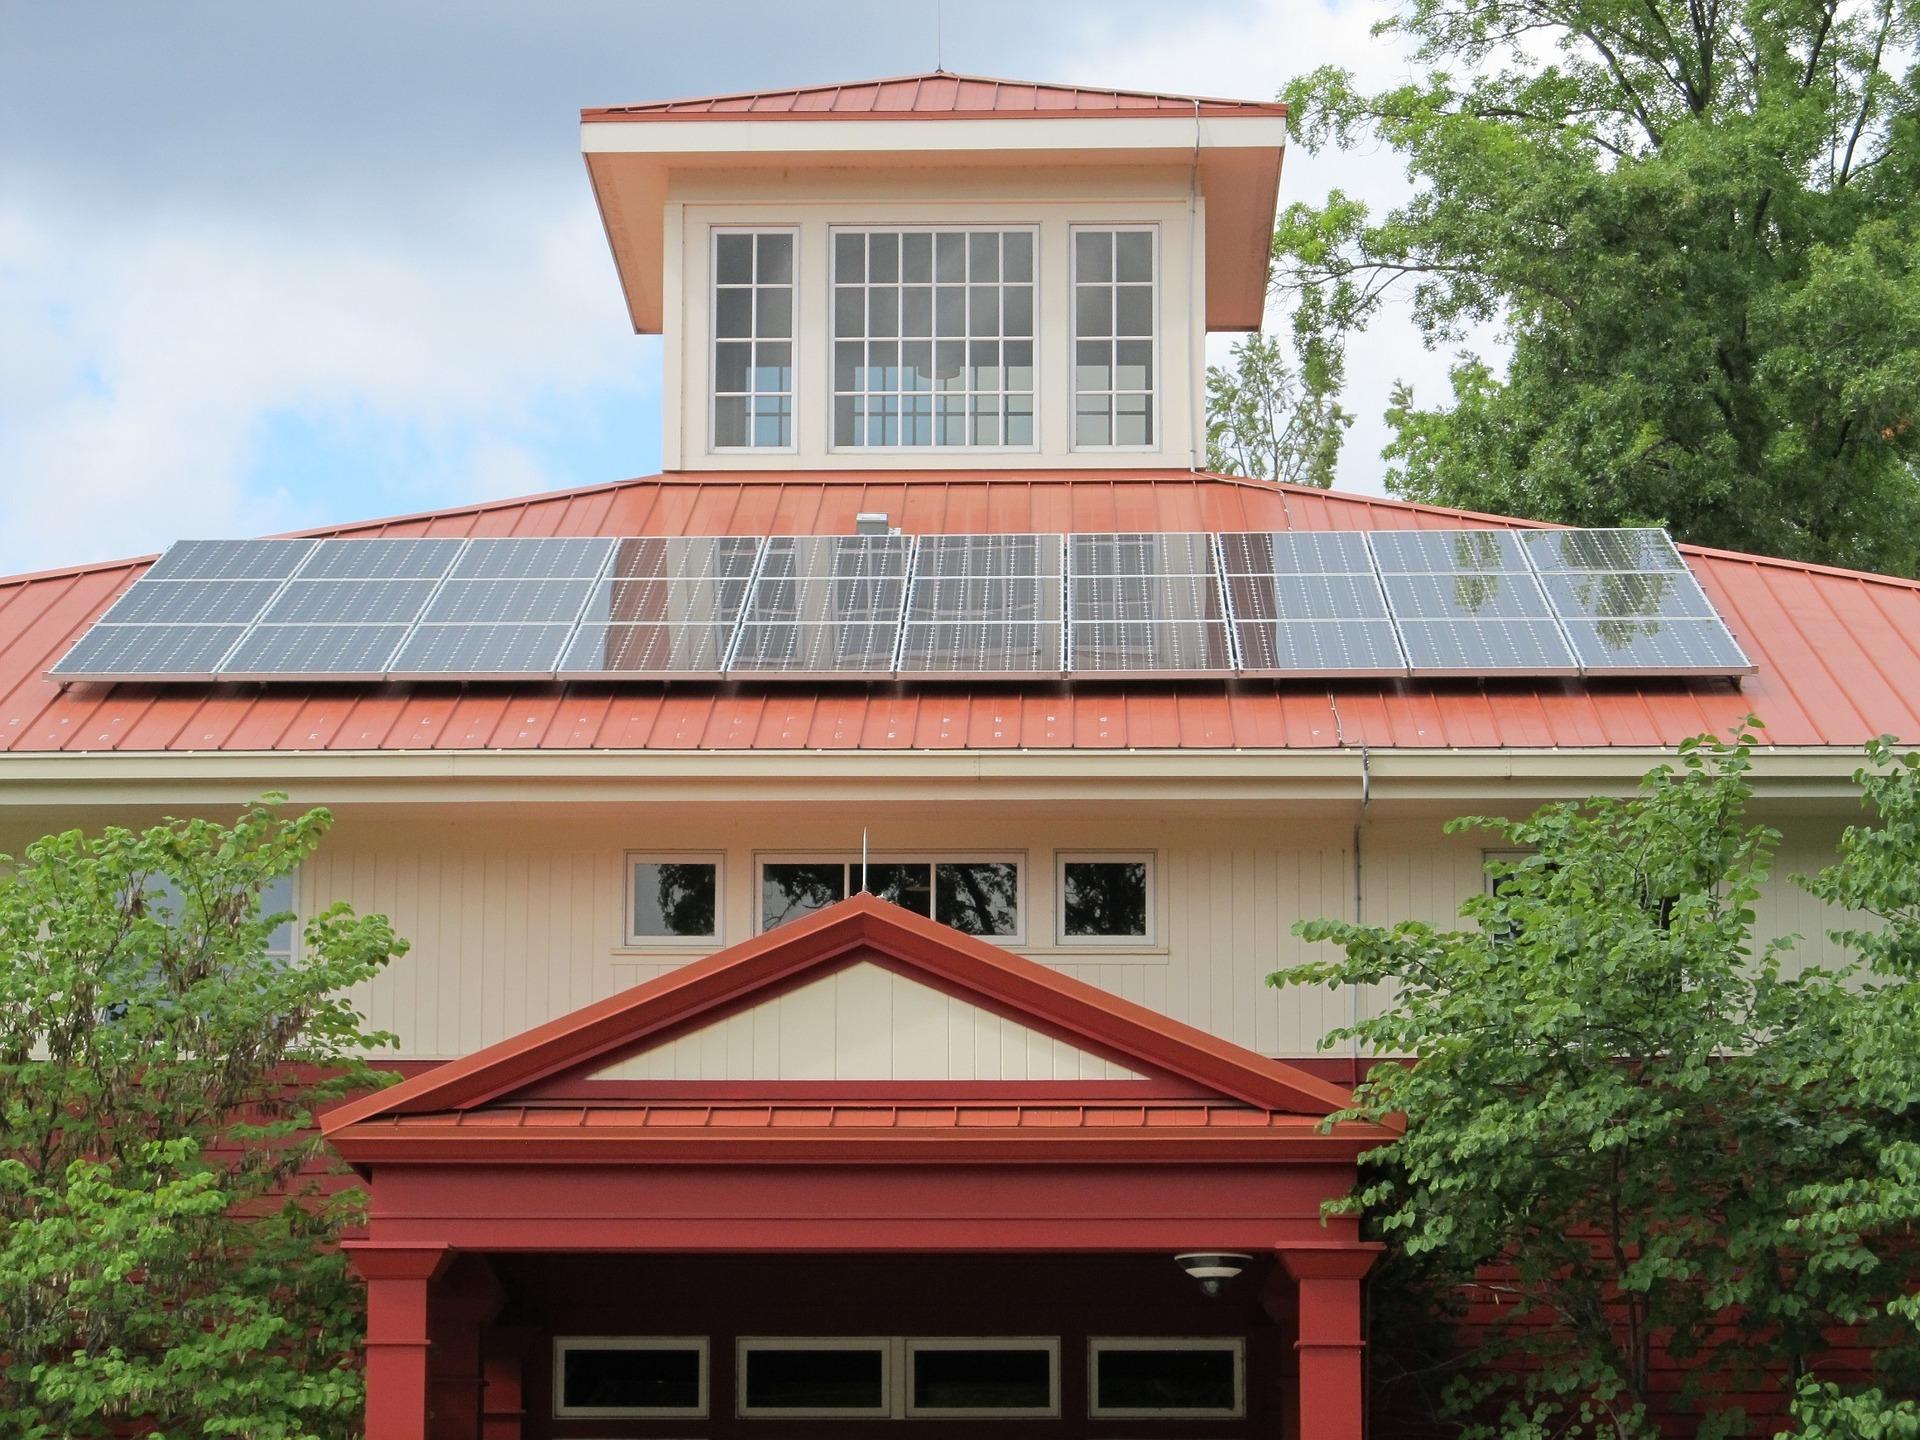 Solar power system installation for churches